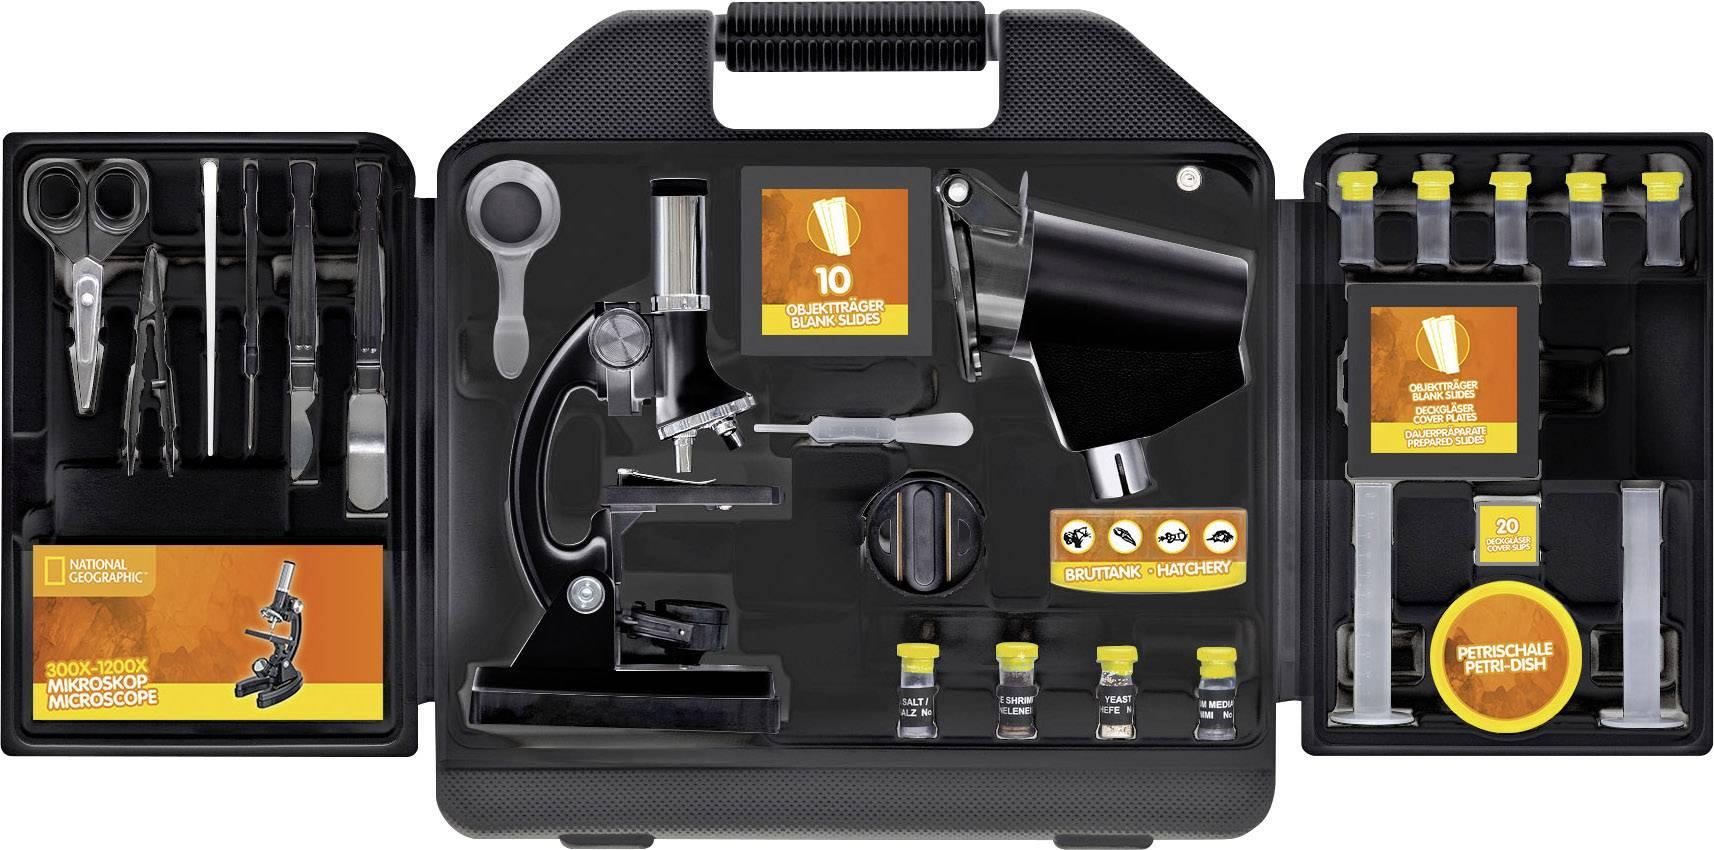 Detský mikroskop National Geographic 9118100, monokulárny, 1200 x